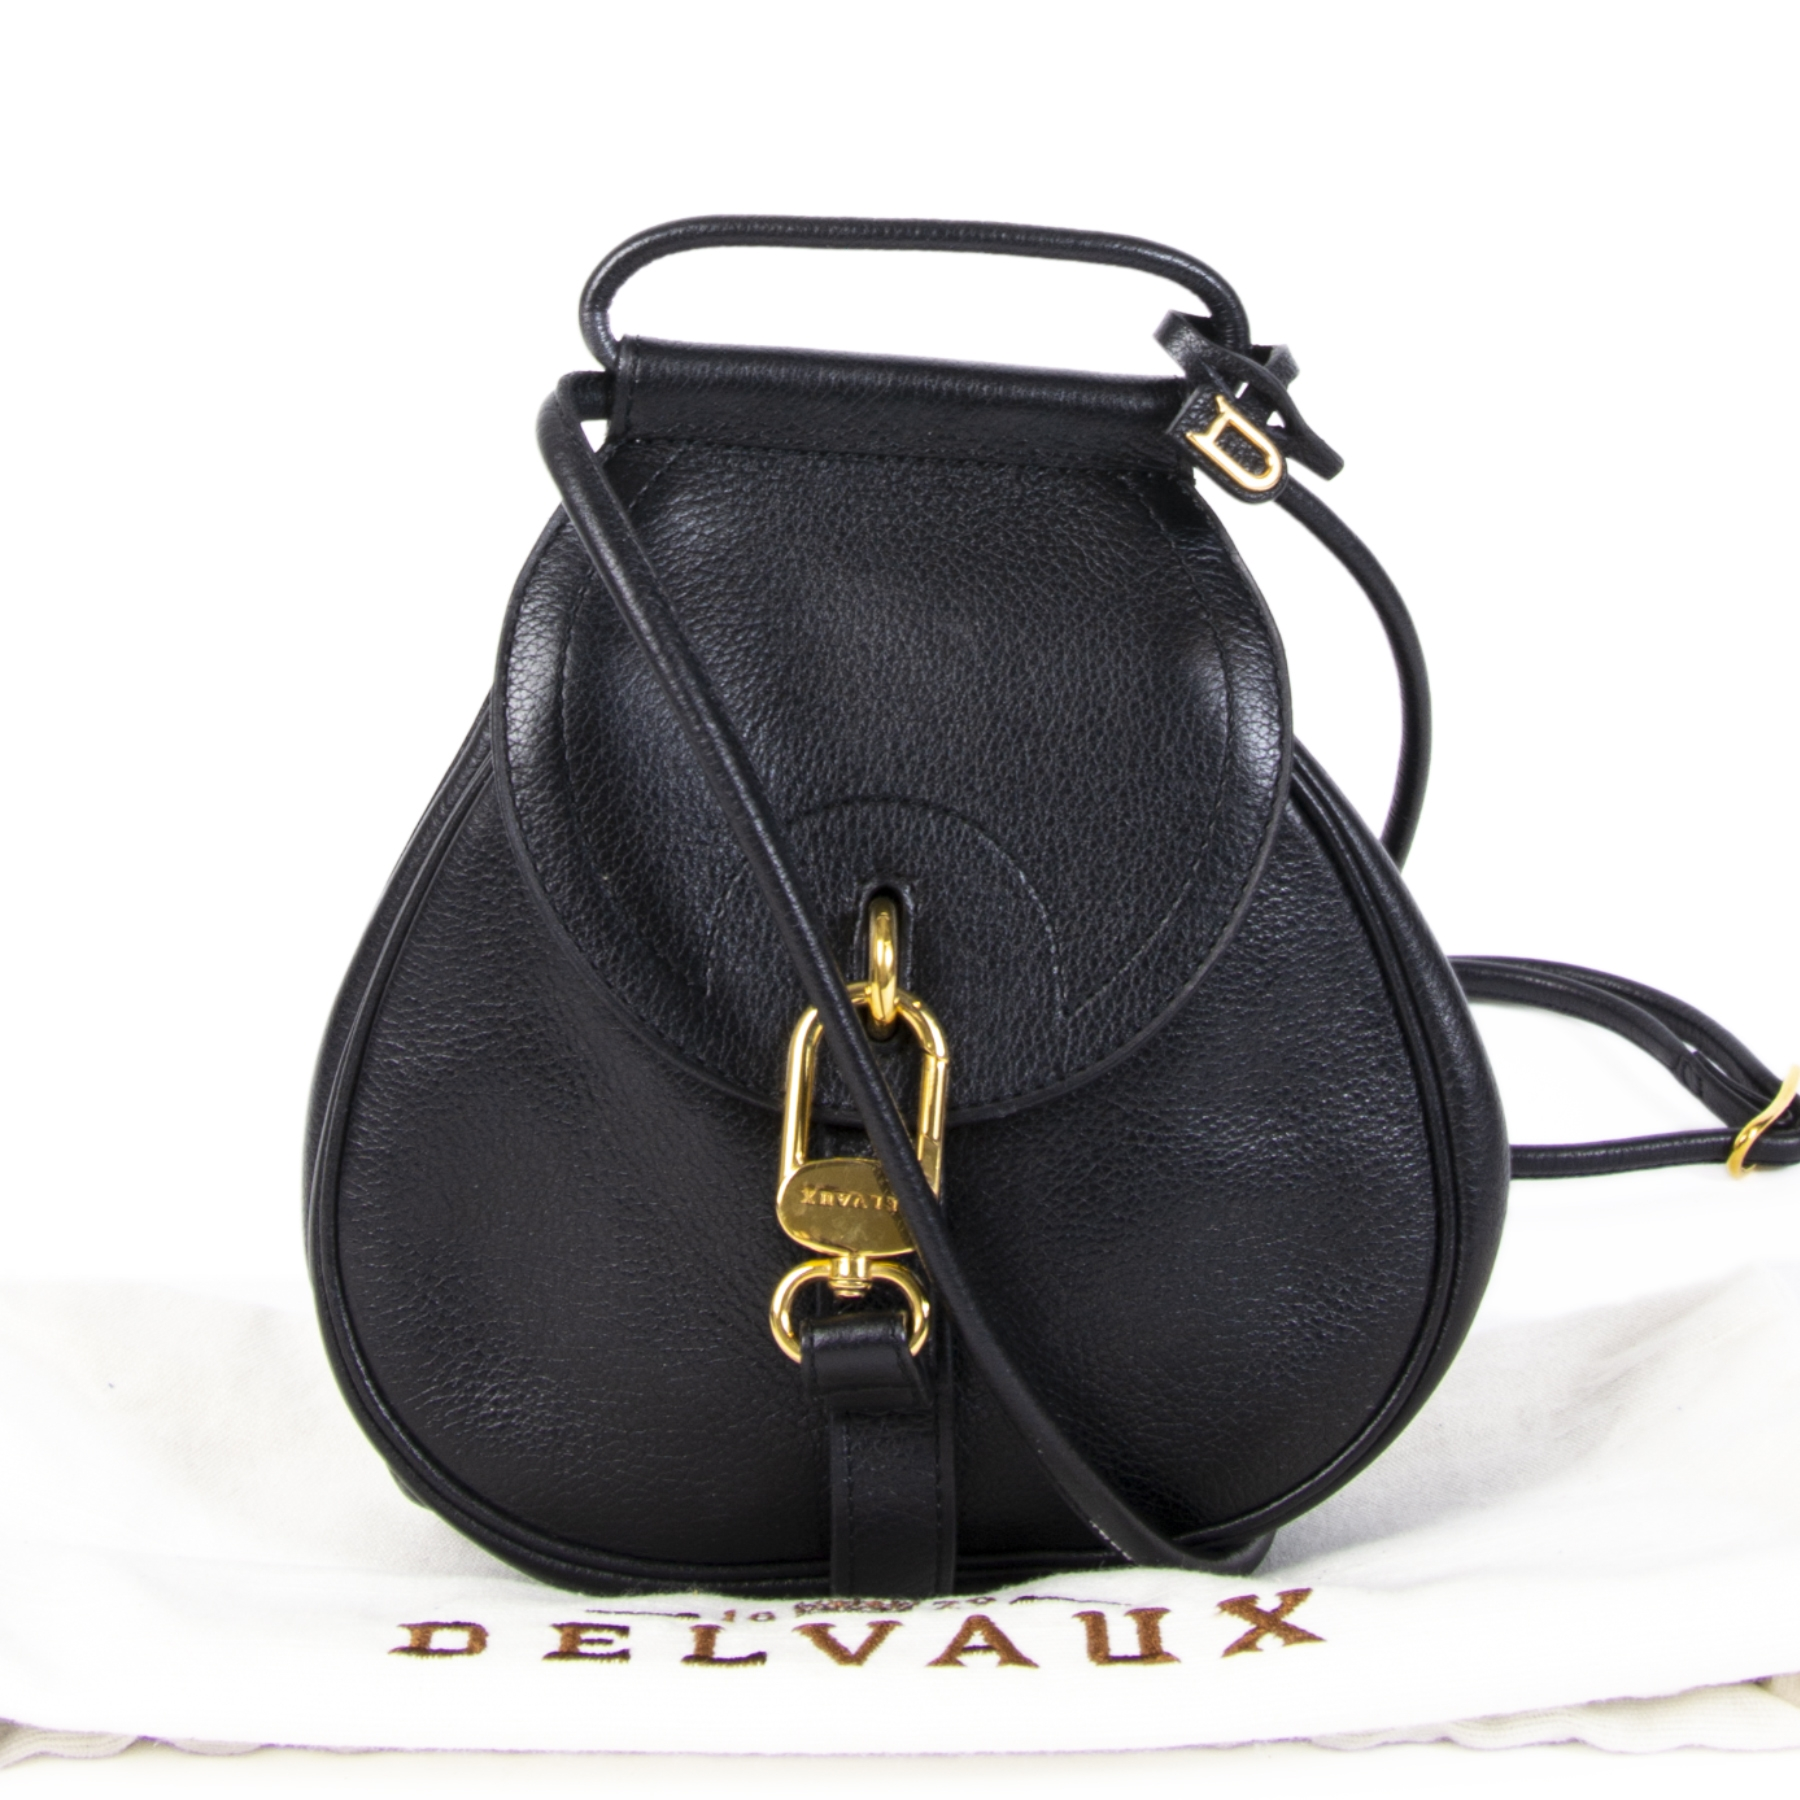 Delvaux Black Cerceau Mini Bag for the best price at Labellov secondhand luxury